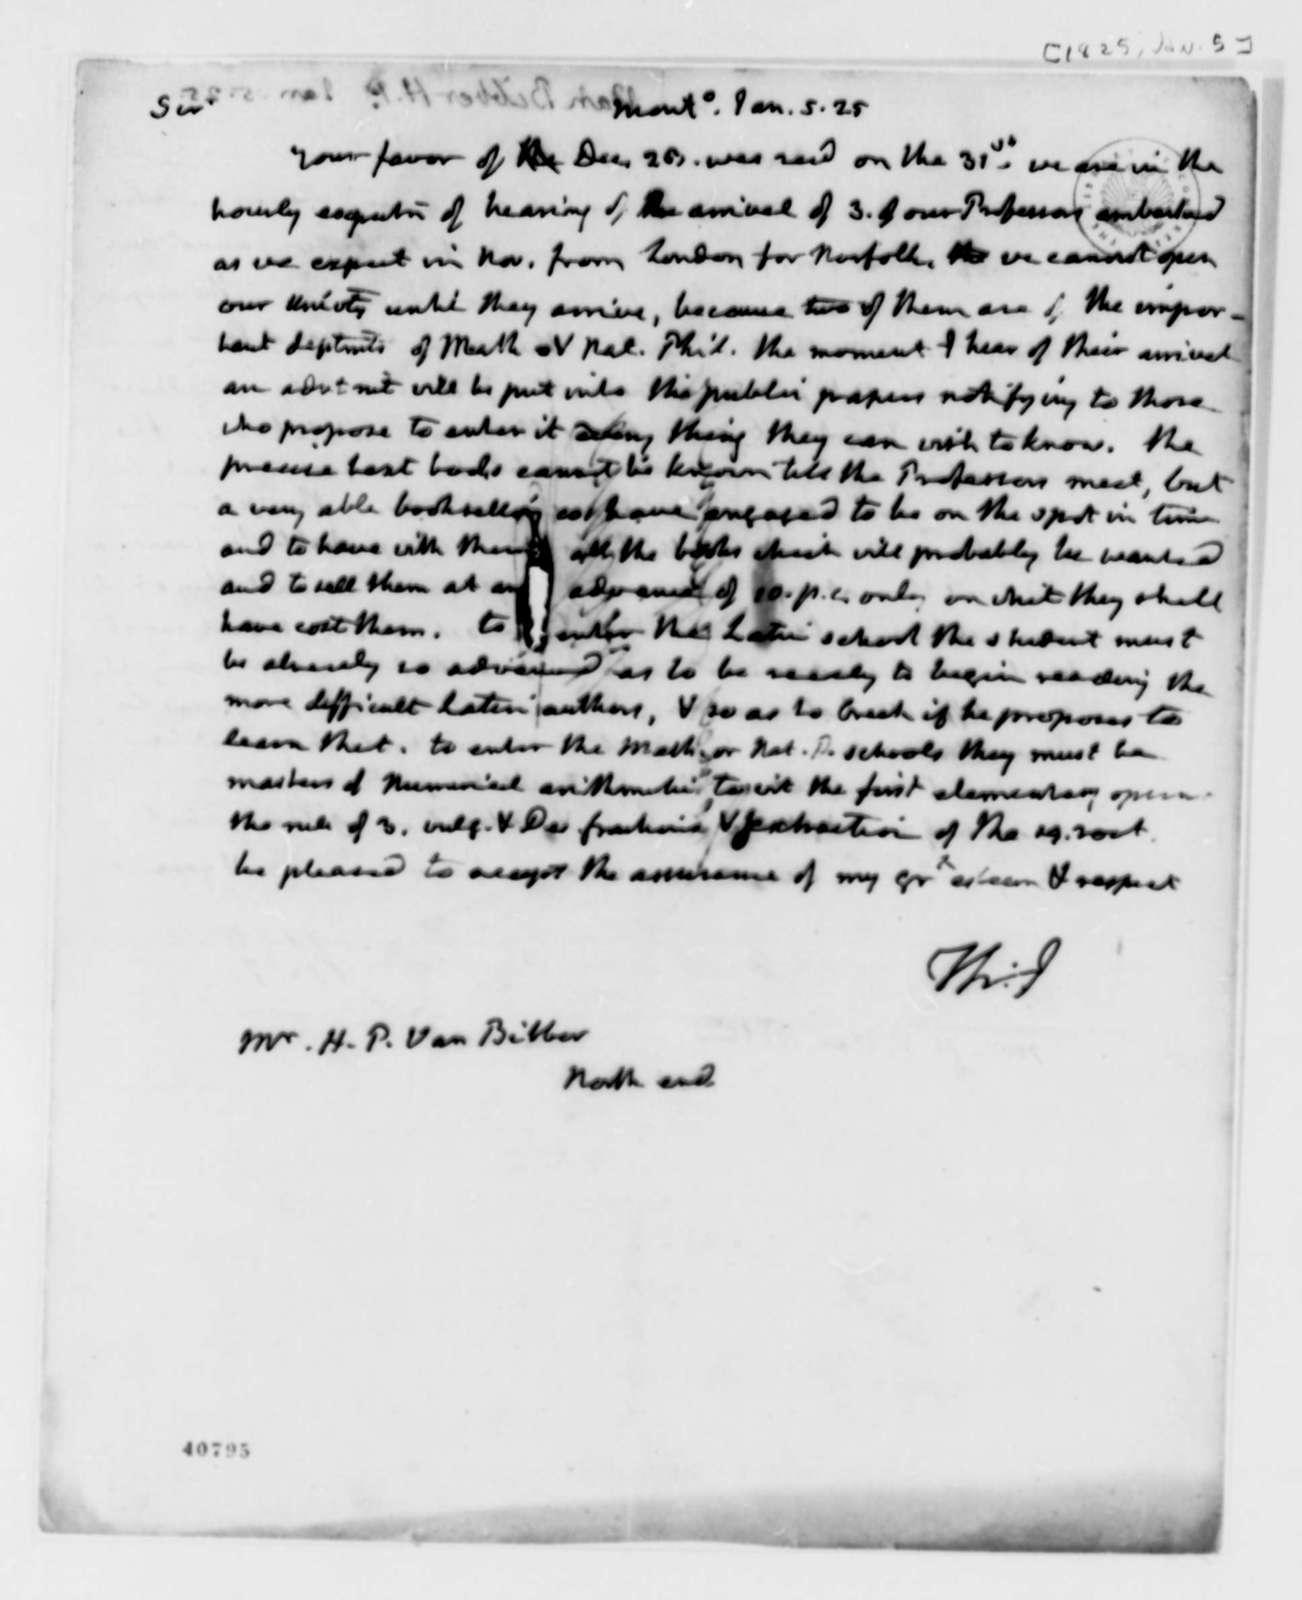 Thomas Jefferson to H. P. van Bibben, January 5, 1825